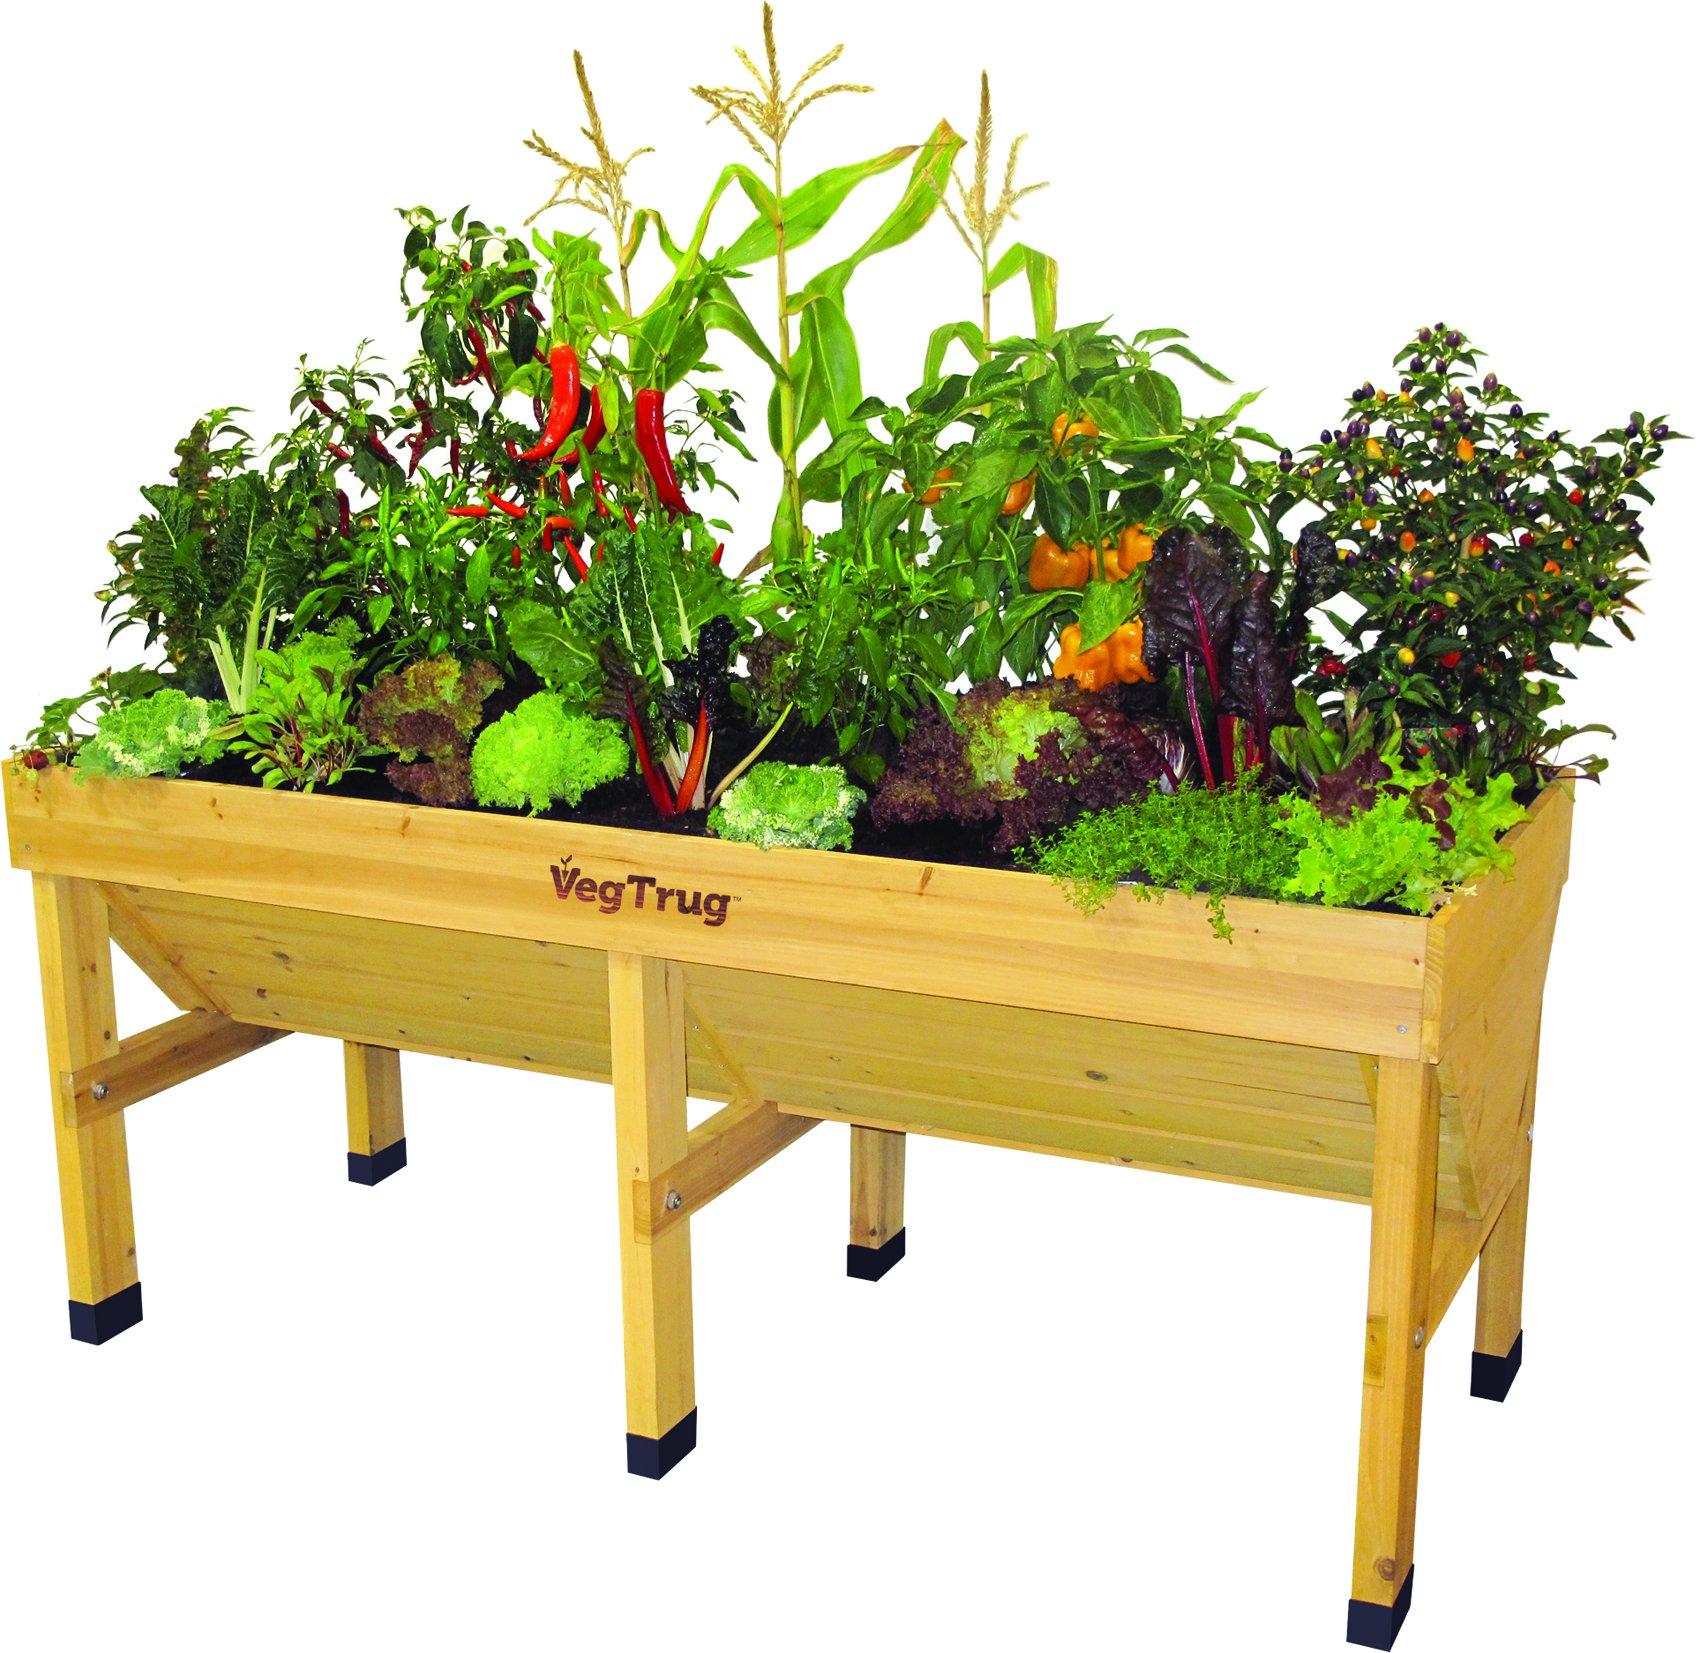 Vegtrug VTNMD 0367 USA Medium Planters